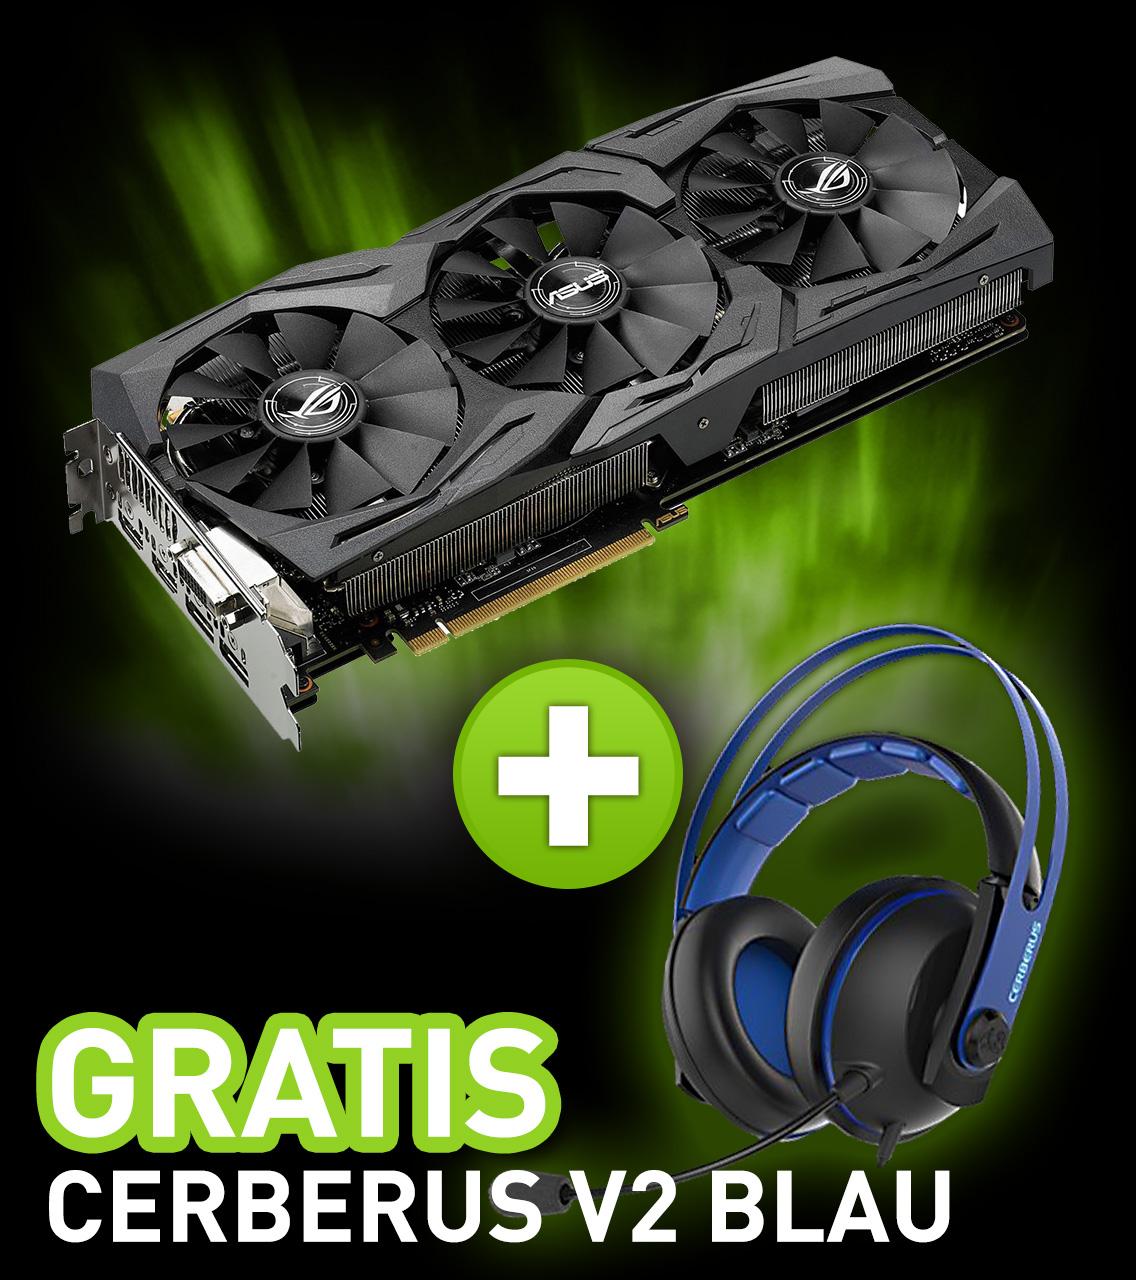 8GB Asus GeForce GTX 1080 Strix Aktiv PCIe 3.0 x16 (Retail)